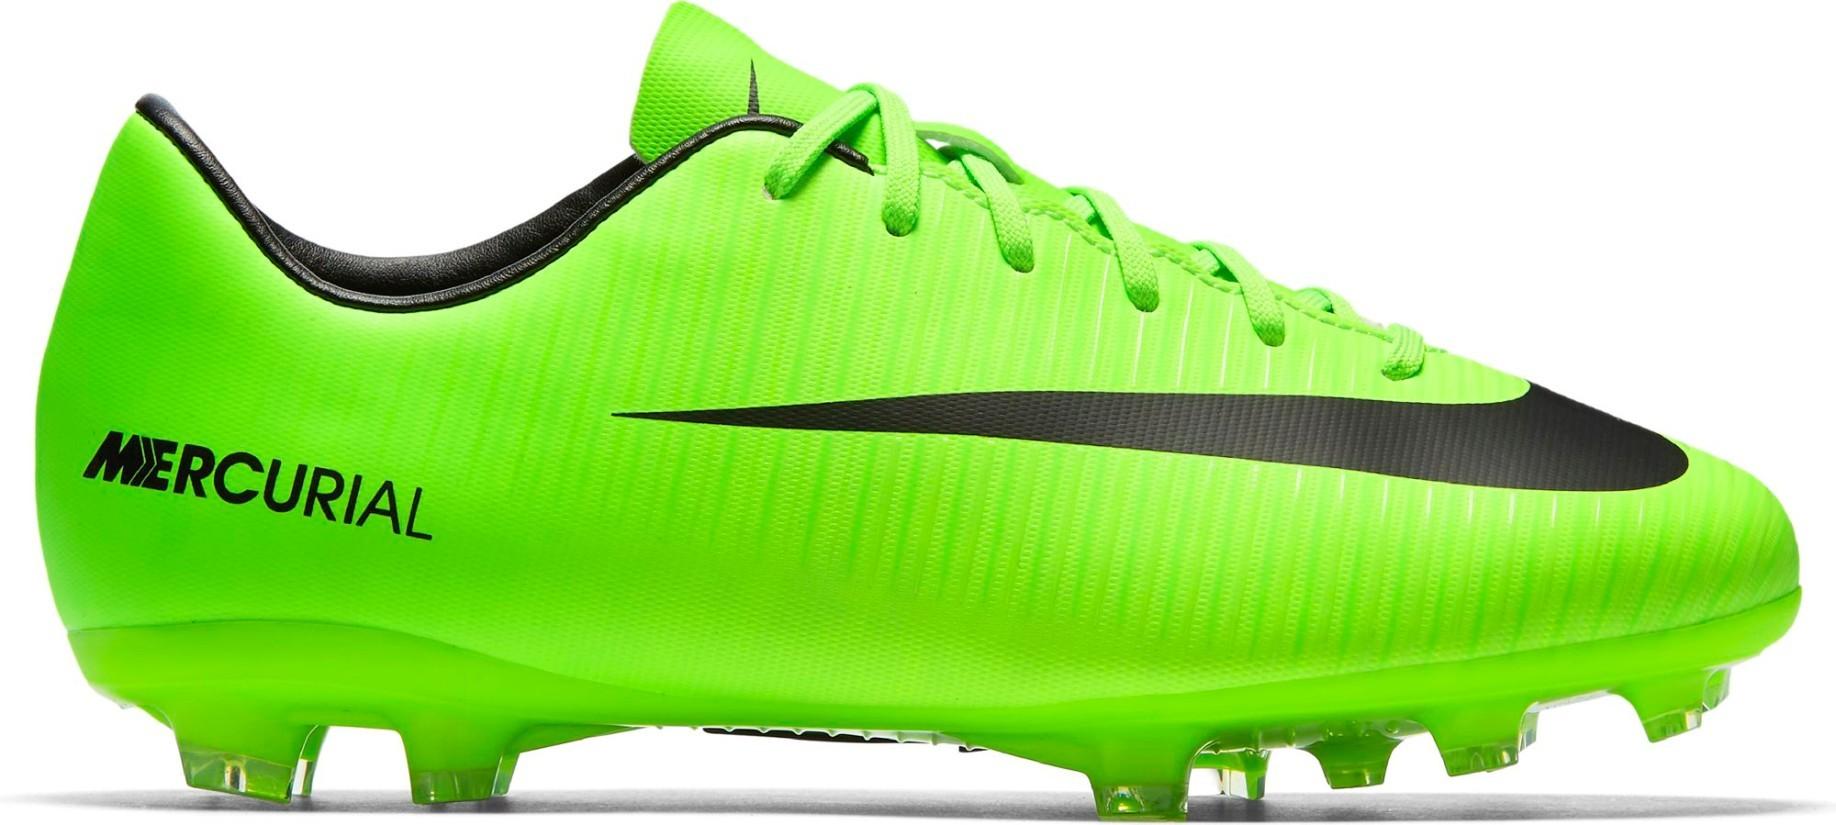 Fg Calcio Flare Mercurial Bambino Pack Scarpe Radiation Nike Vapor w7q4vp6